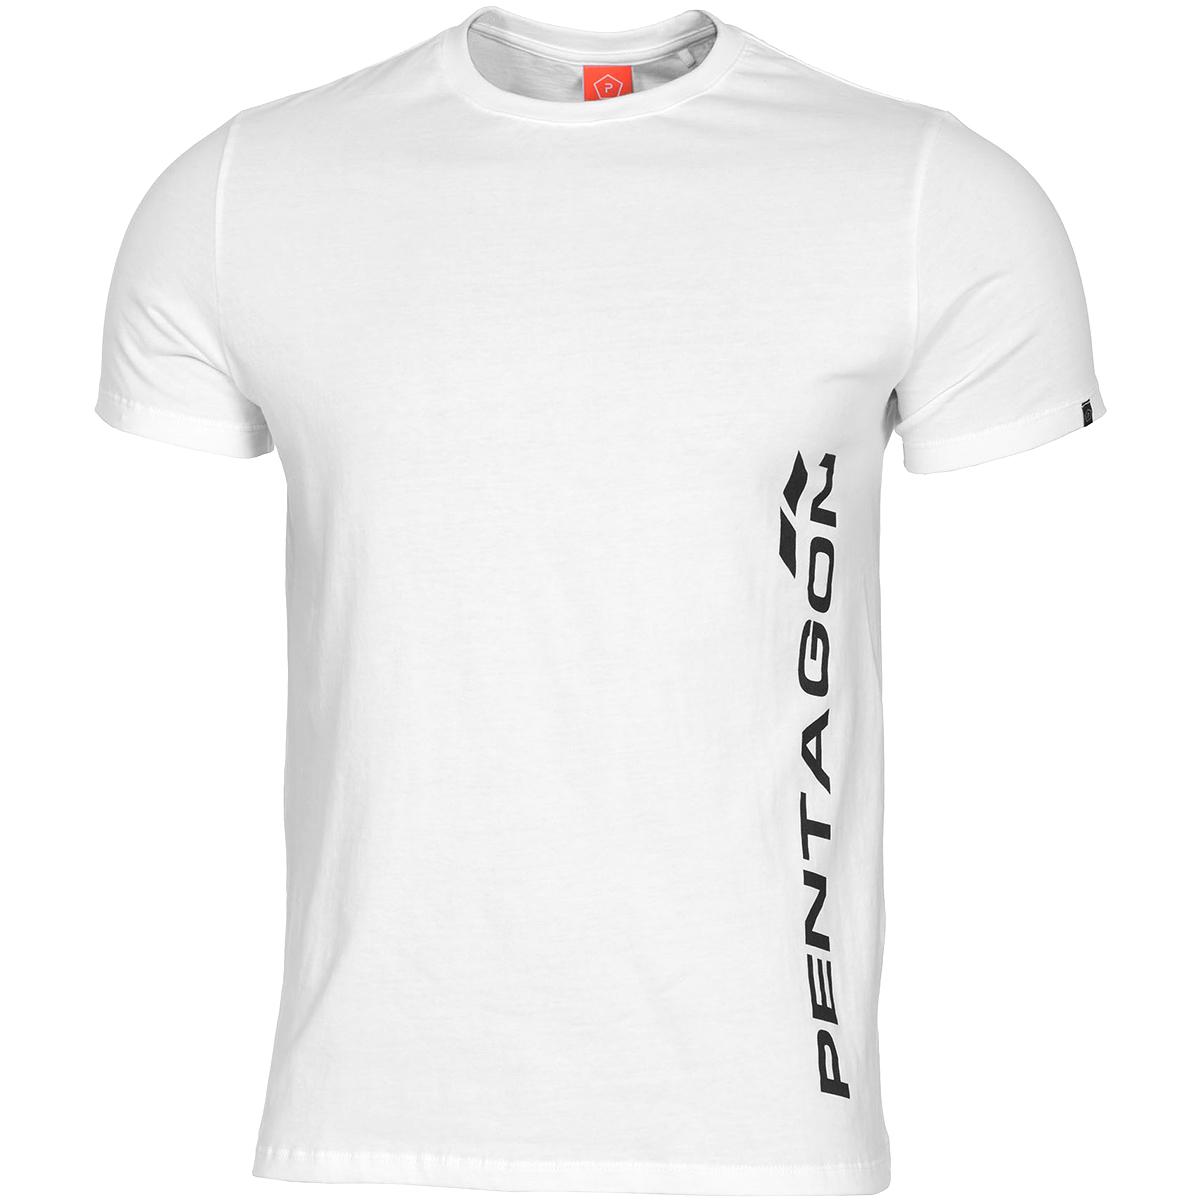 Pentagon Ageron T-Shirt Pentagon Vertical White Pentagon Ageron T-Shirt  Pentagon Vertical White